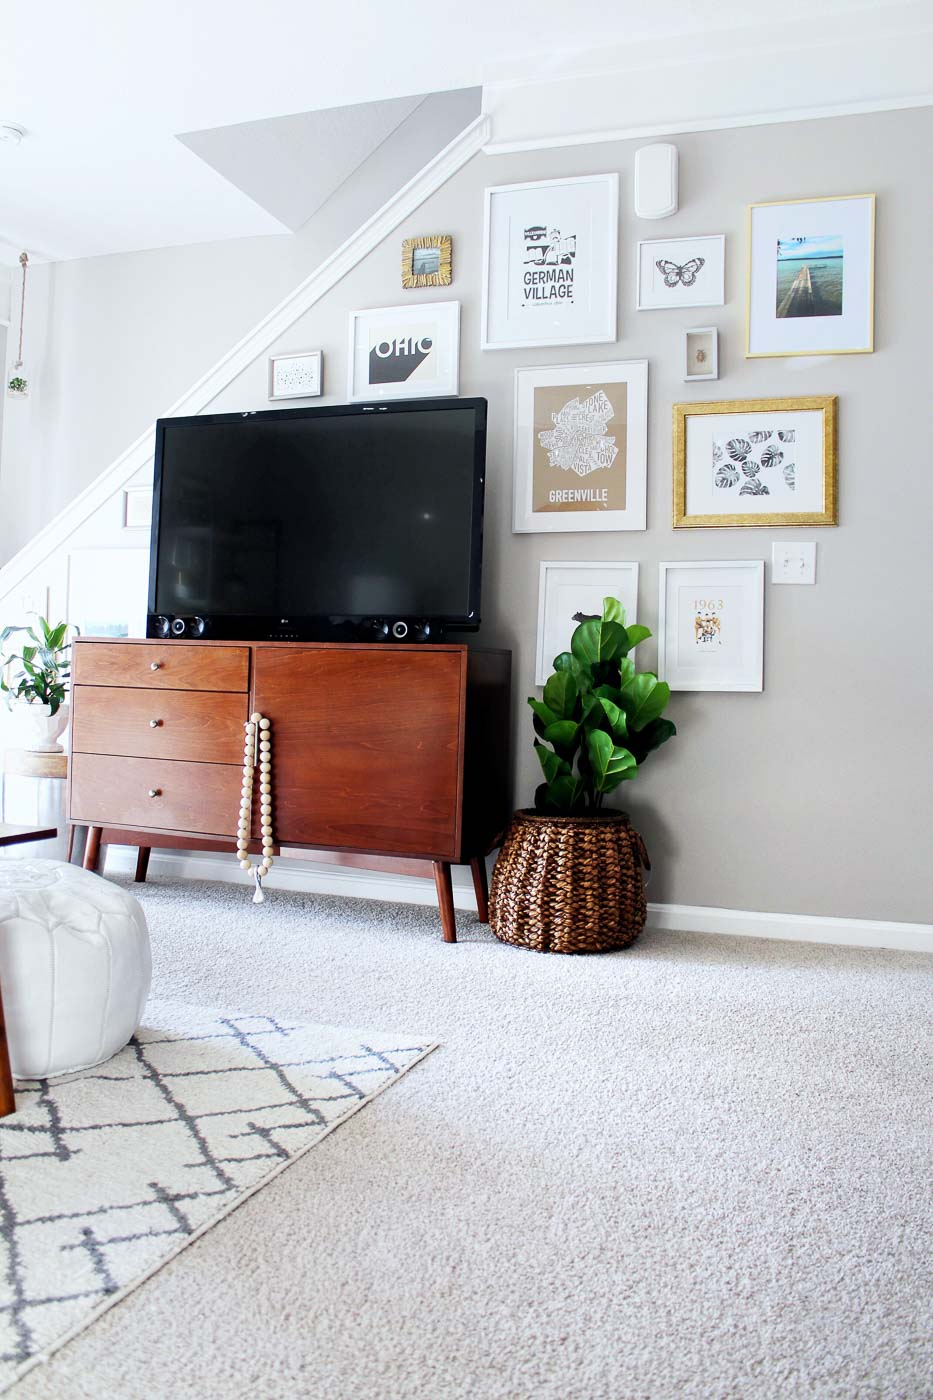 cozy-quarters-ohio-natural-light-photography-studio-lifestyle-photographer-3.jpg